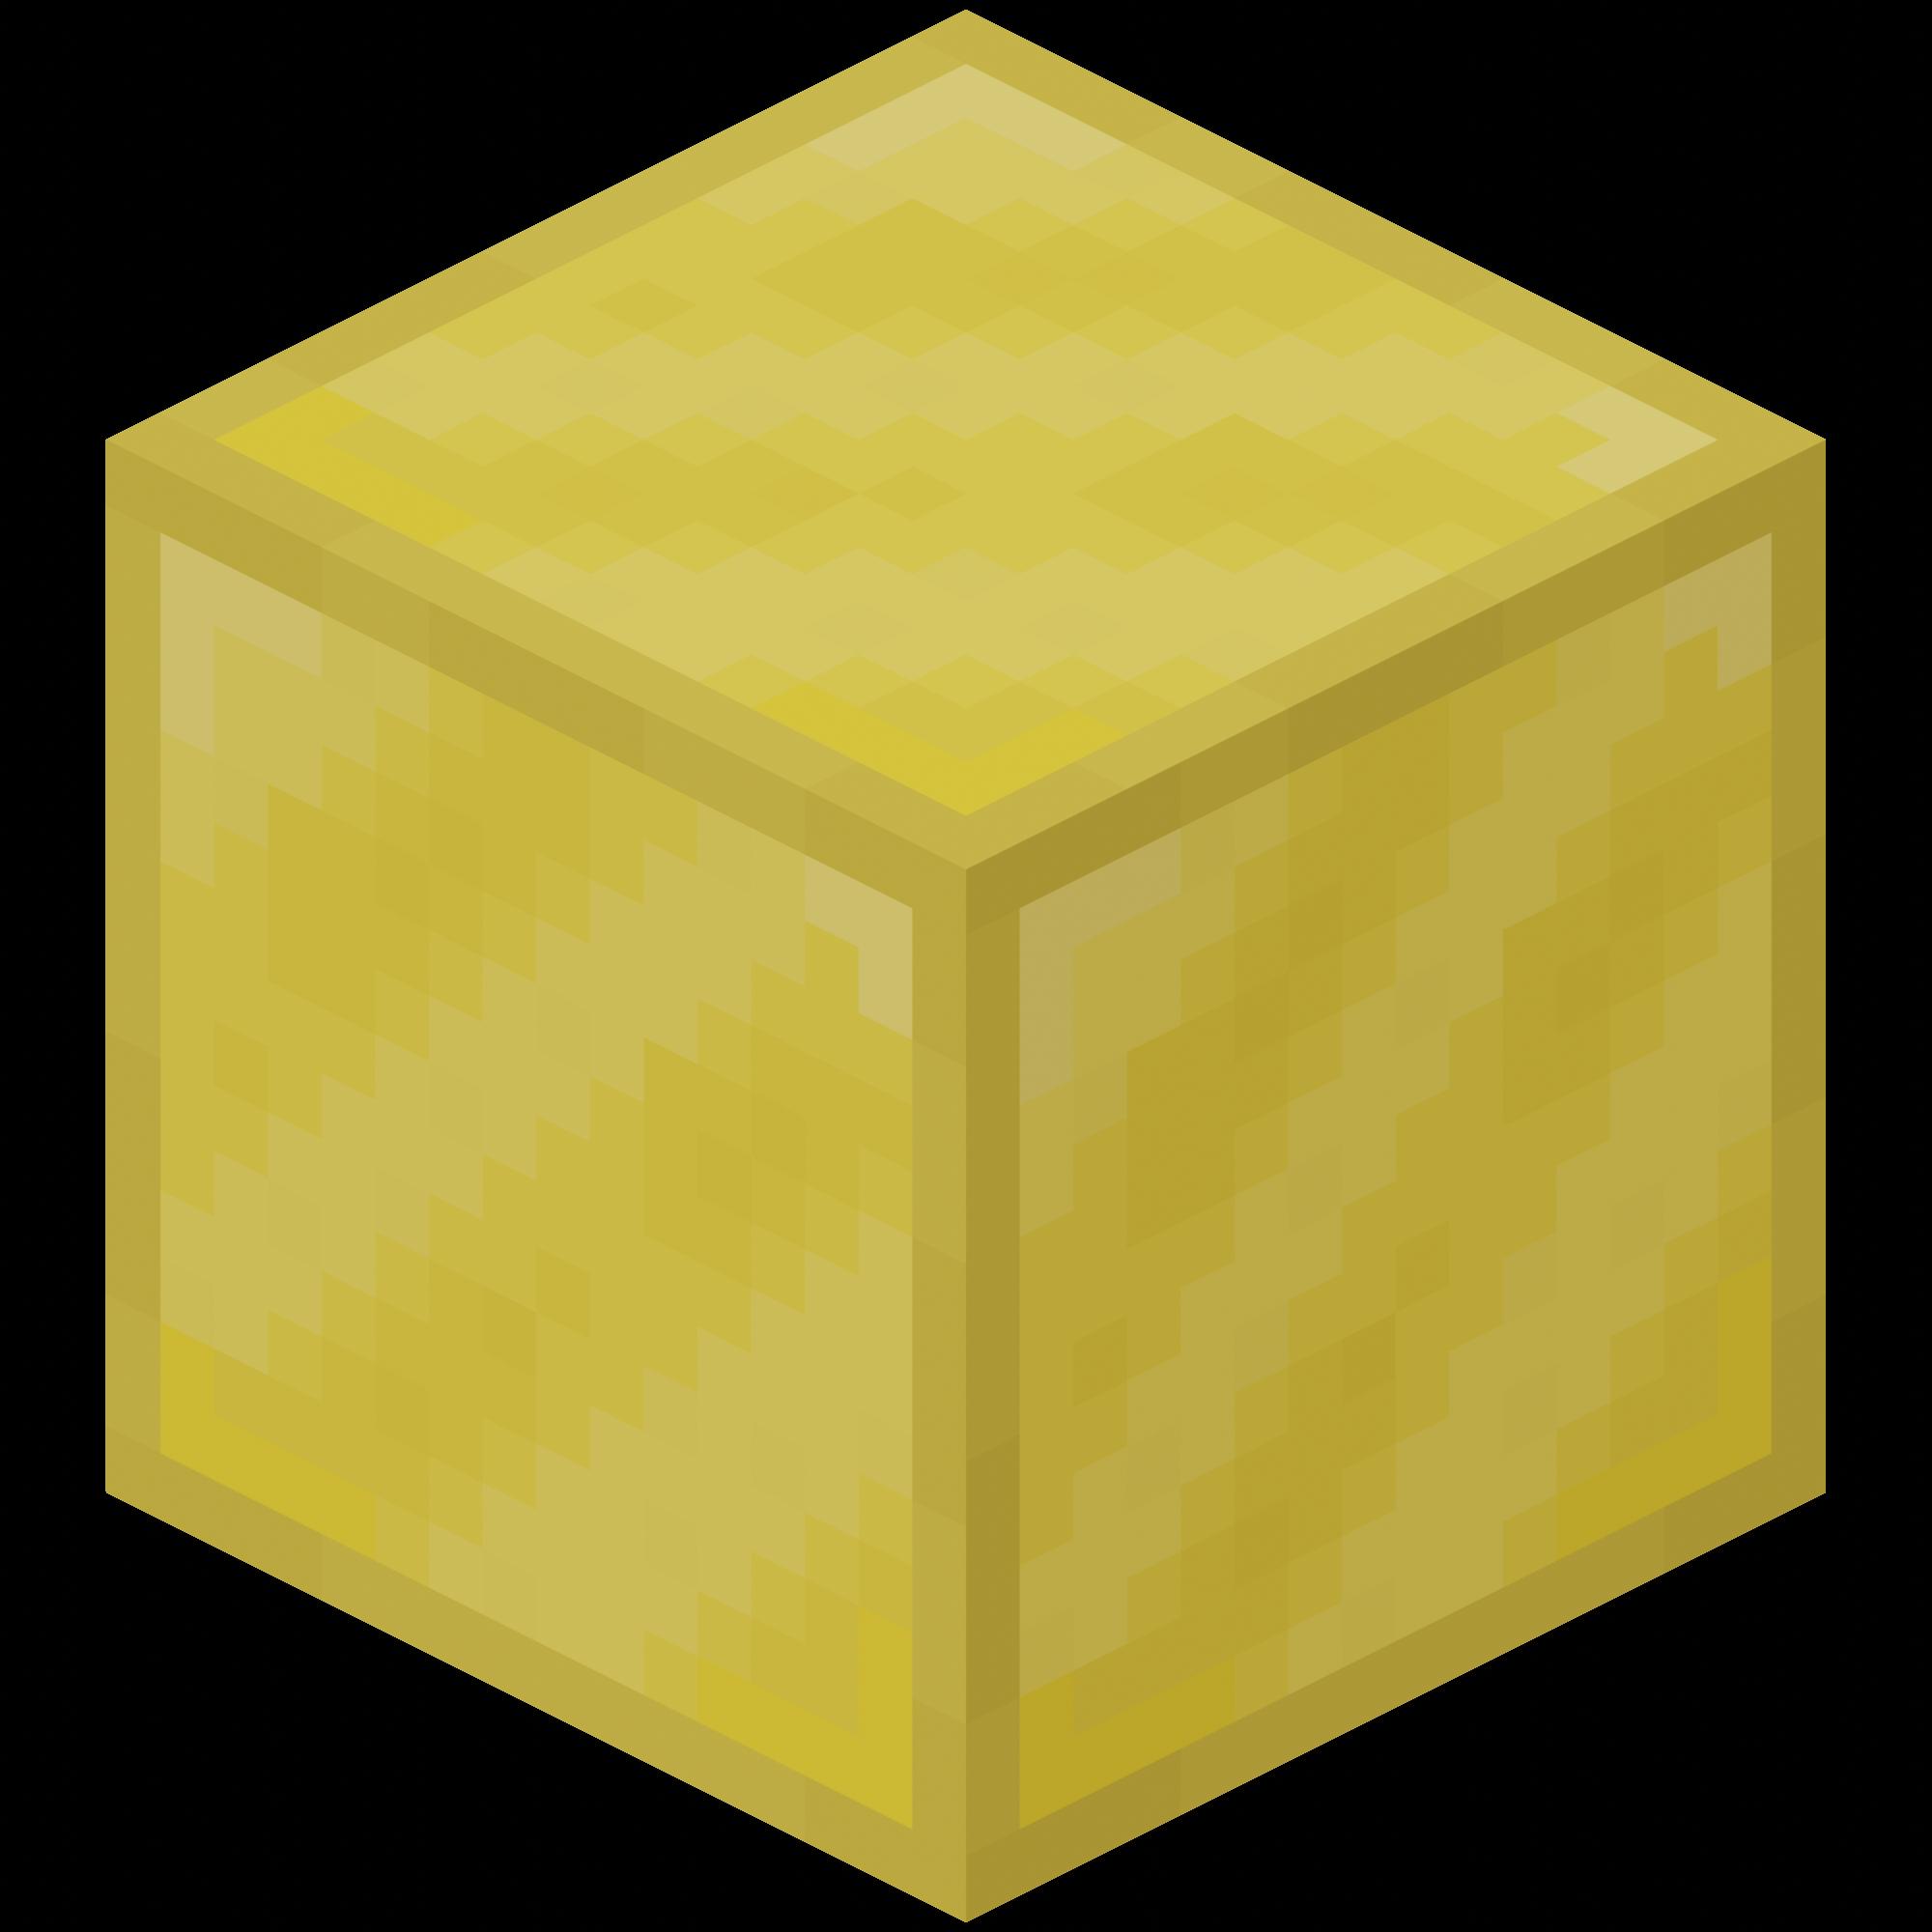 Gold Block - Skyblock Roblox Wiki